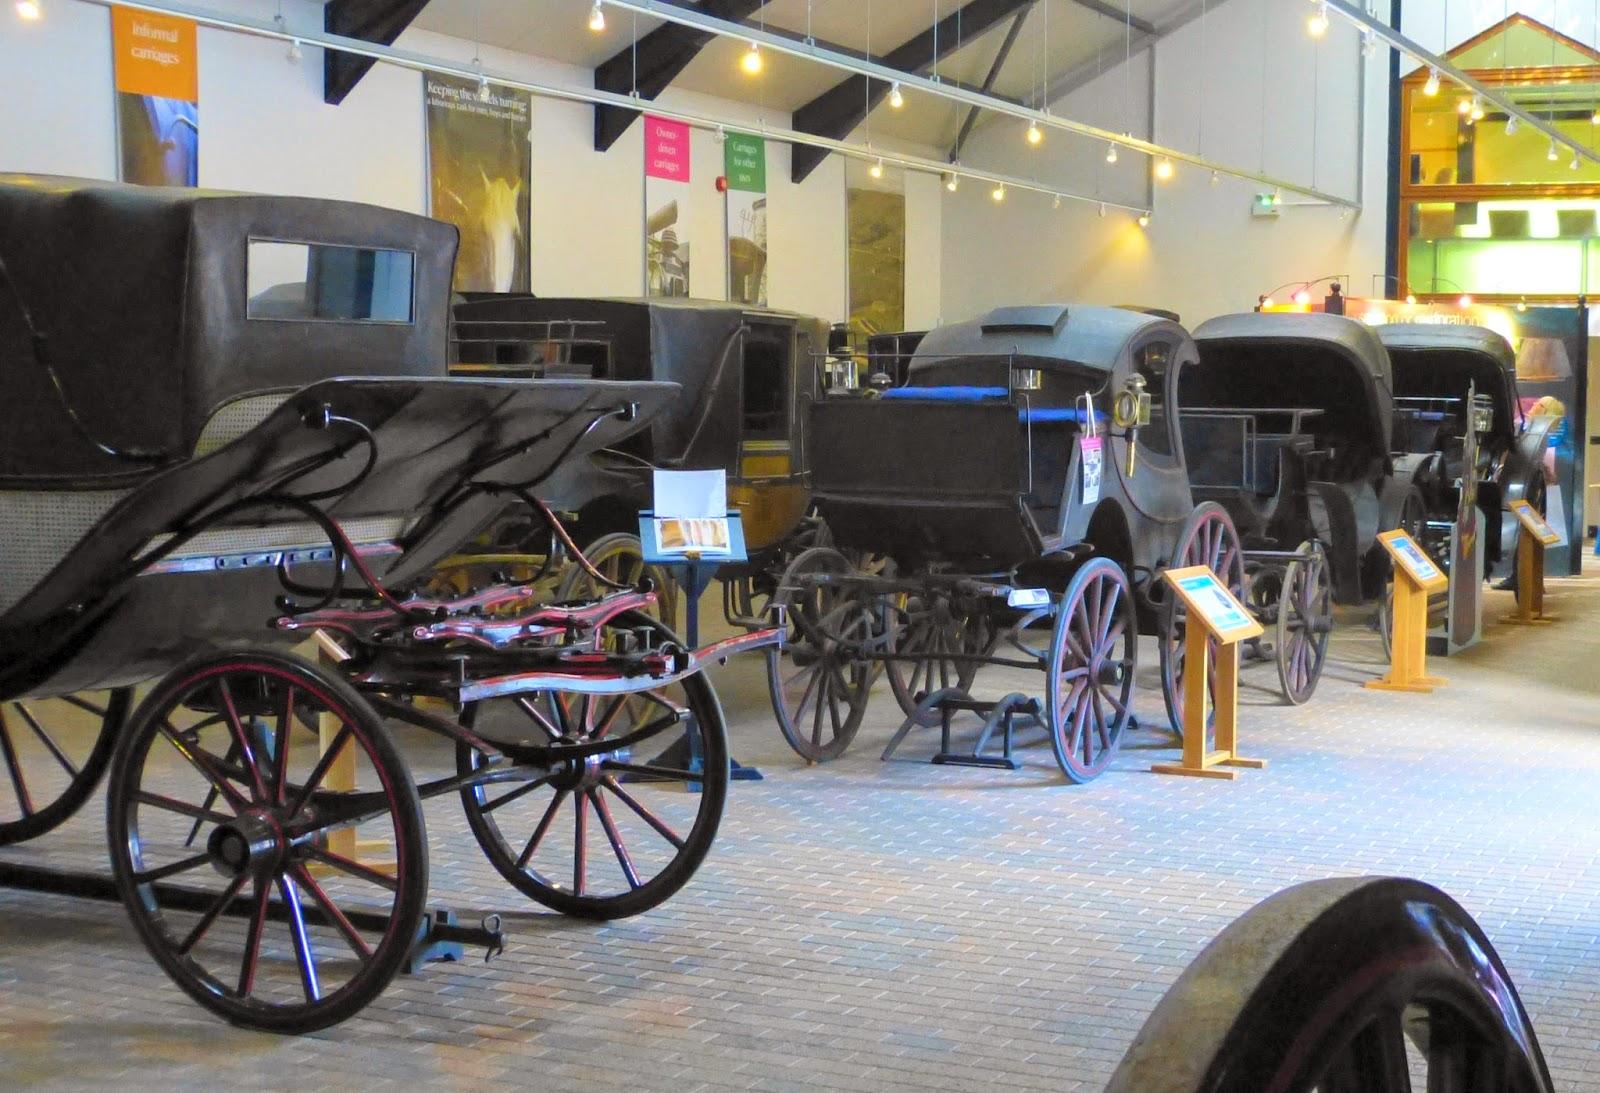 The National Trust Carriage Museum, Arlington Court